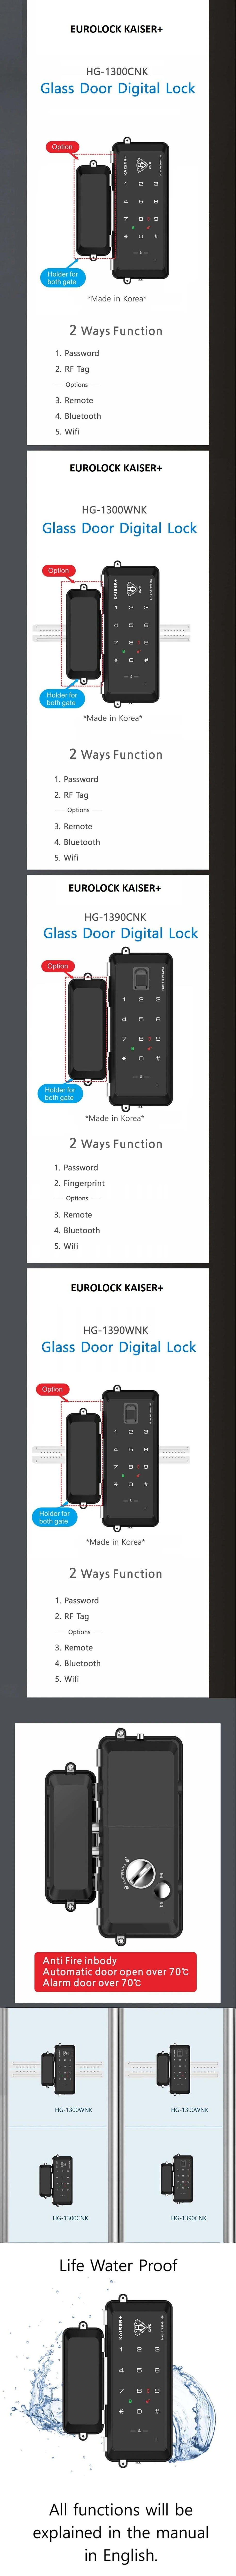 Khóa vân tay cửa kính EUROLOCK KAISER+